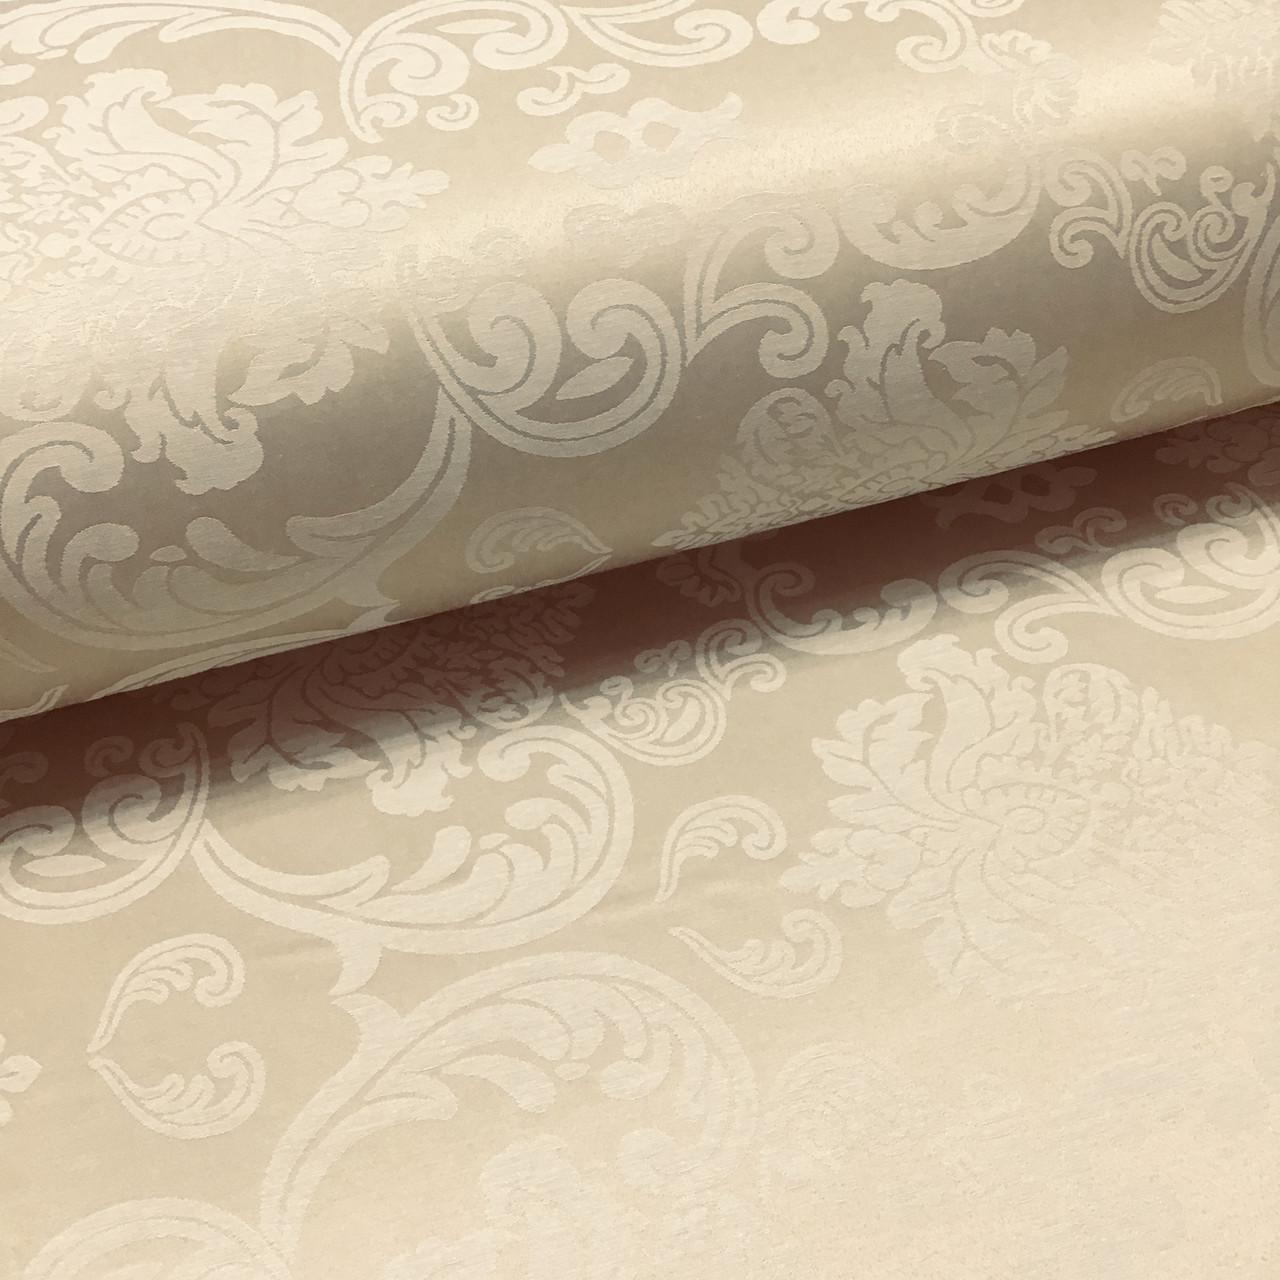 Ткань сатин с рисунком, дамаск крупный бежевый (ТУРЦИЯ шир. 2,4 м)